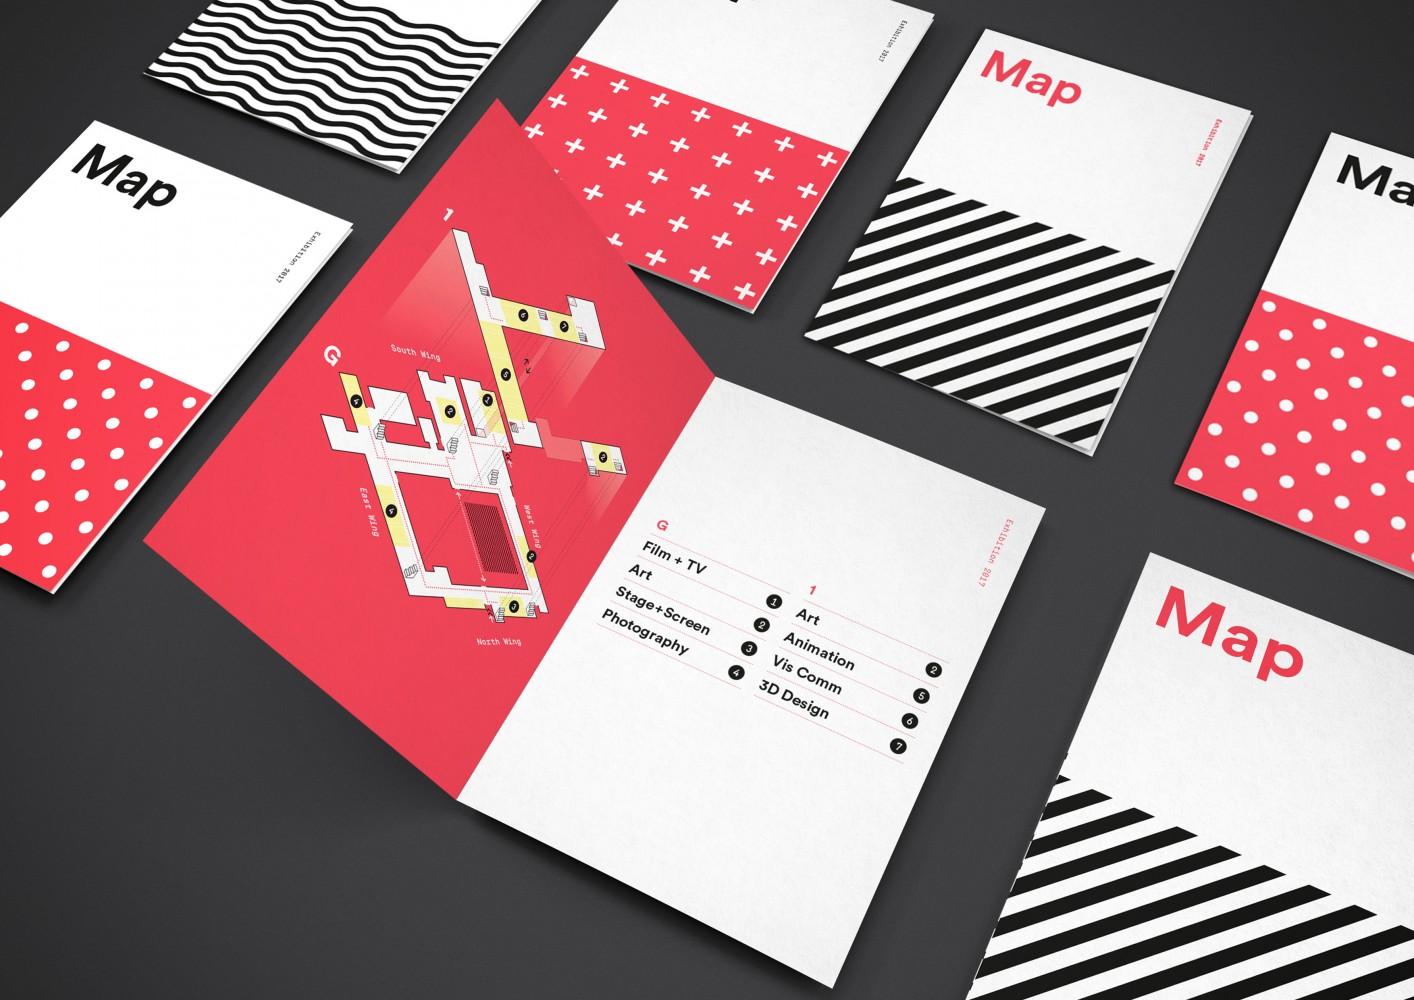 IADT校园标识设计©Detail. Design Studio